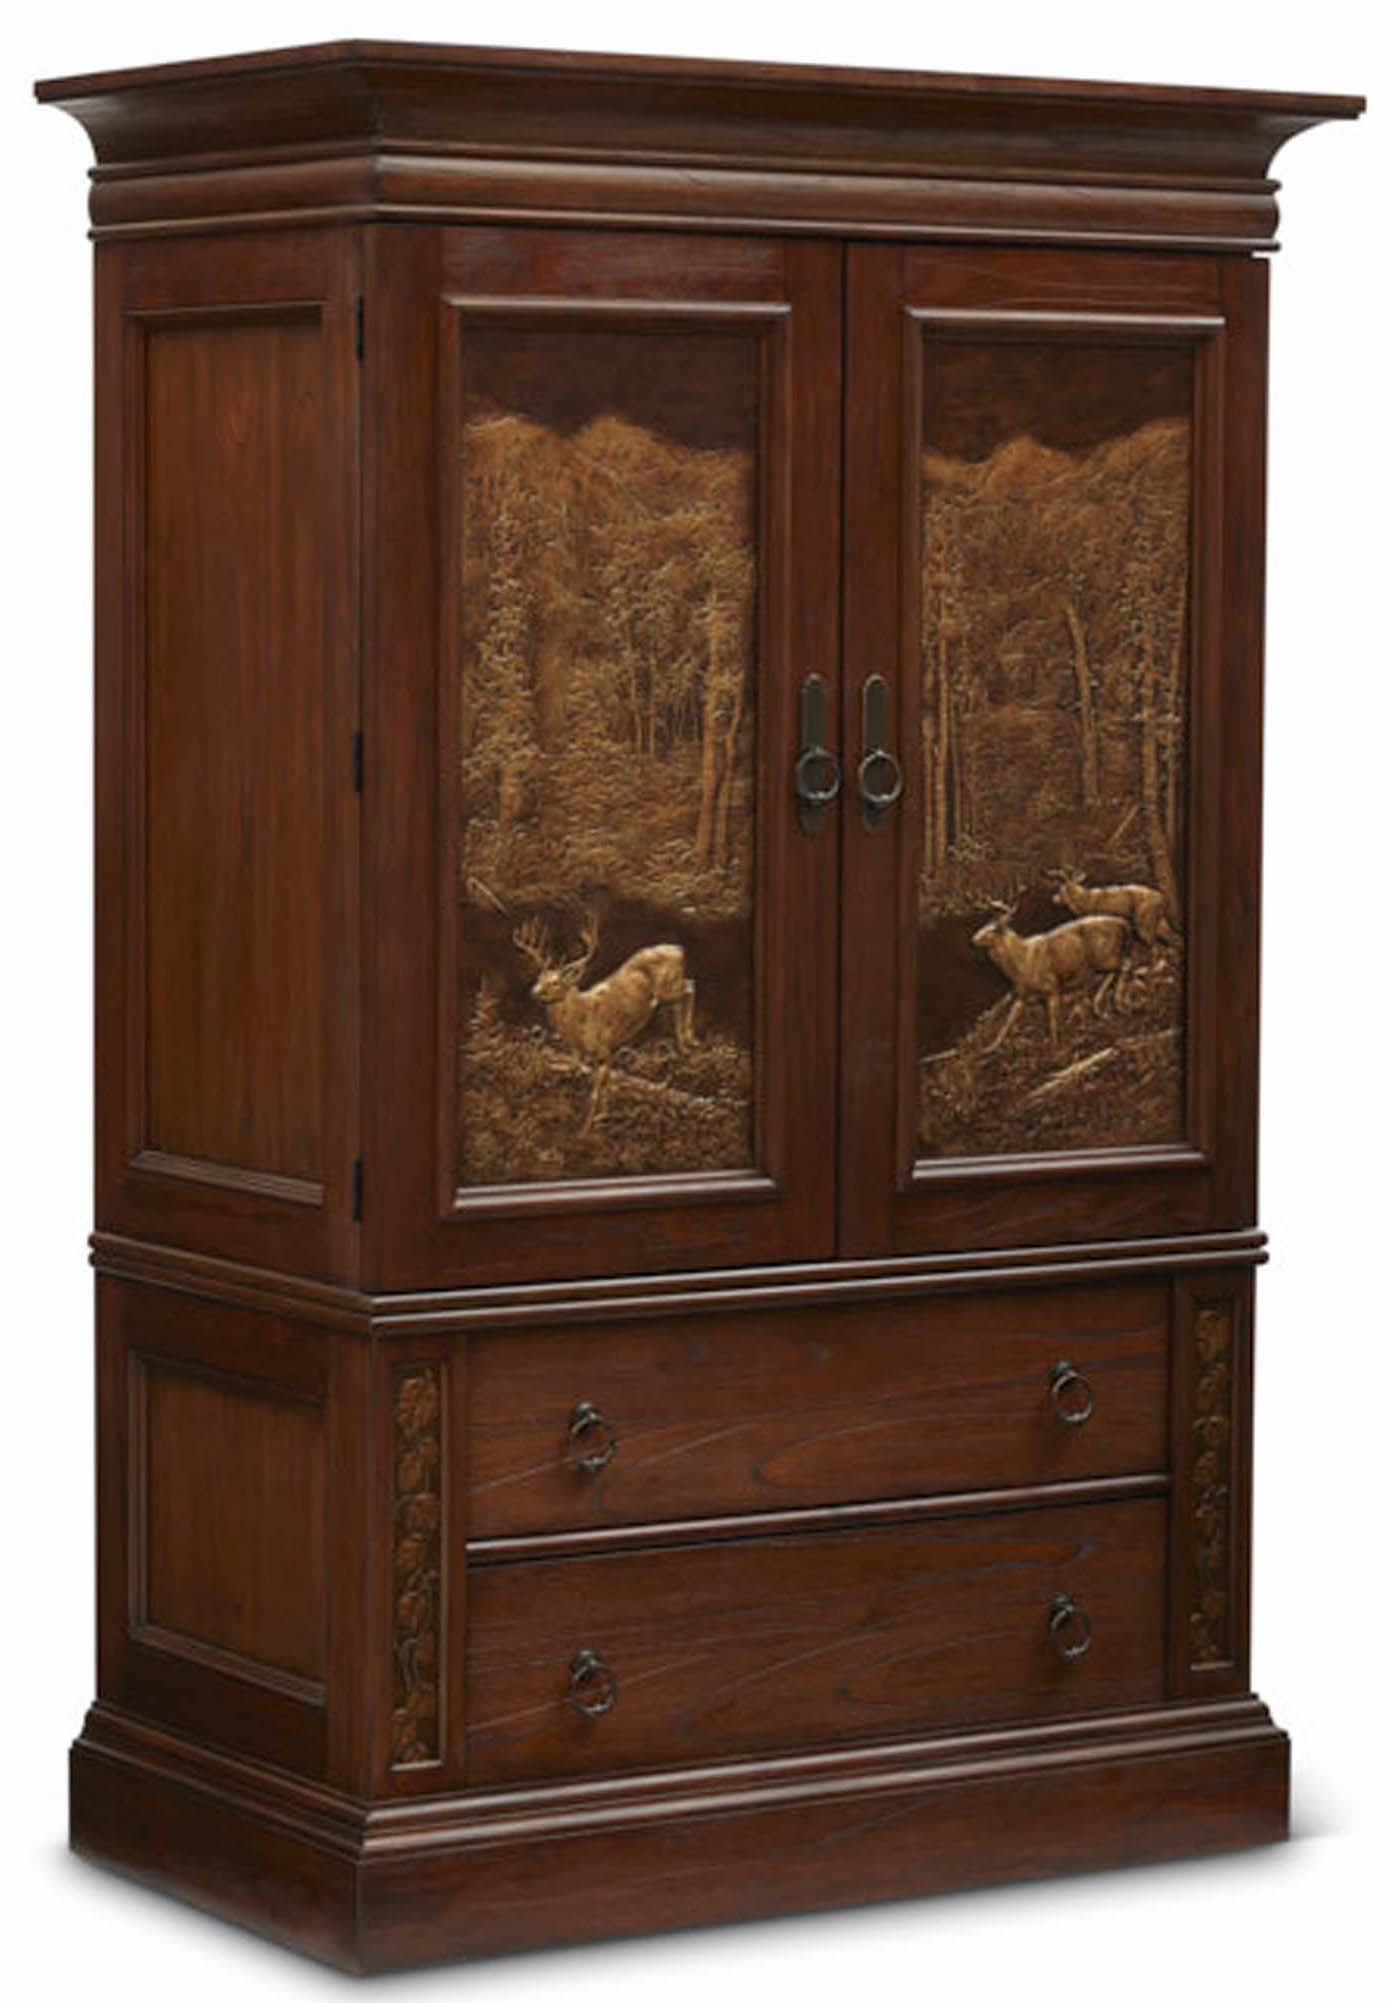 "Aspen Armoire with Hidden Gun Cabinet  Item # DI-167403 (G / LB / DB) Dimensions: 52 x 28.375 x 79-3/8""H"